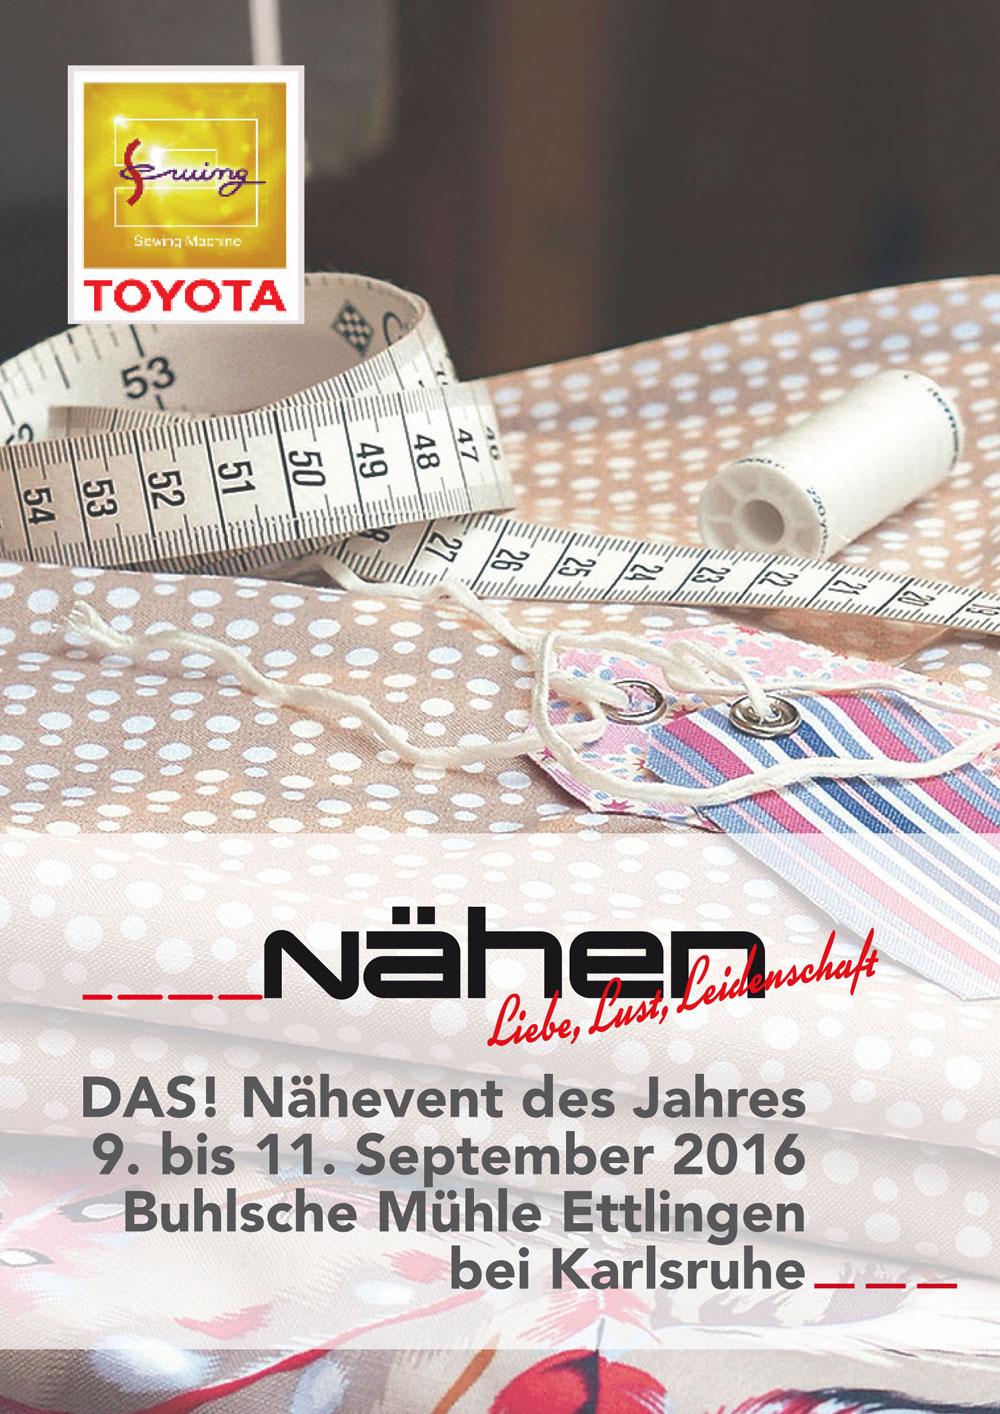 Toyota-Nähevent toyota-nähevent Der TOYOTA-NähEVENT